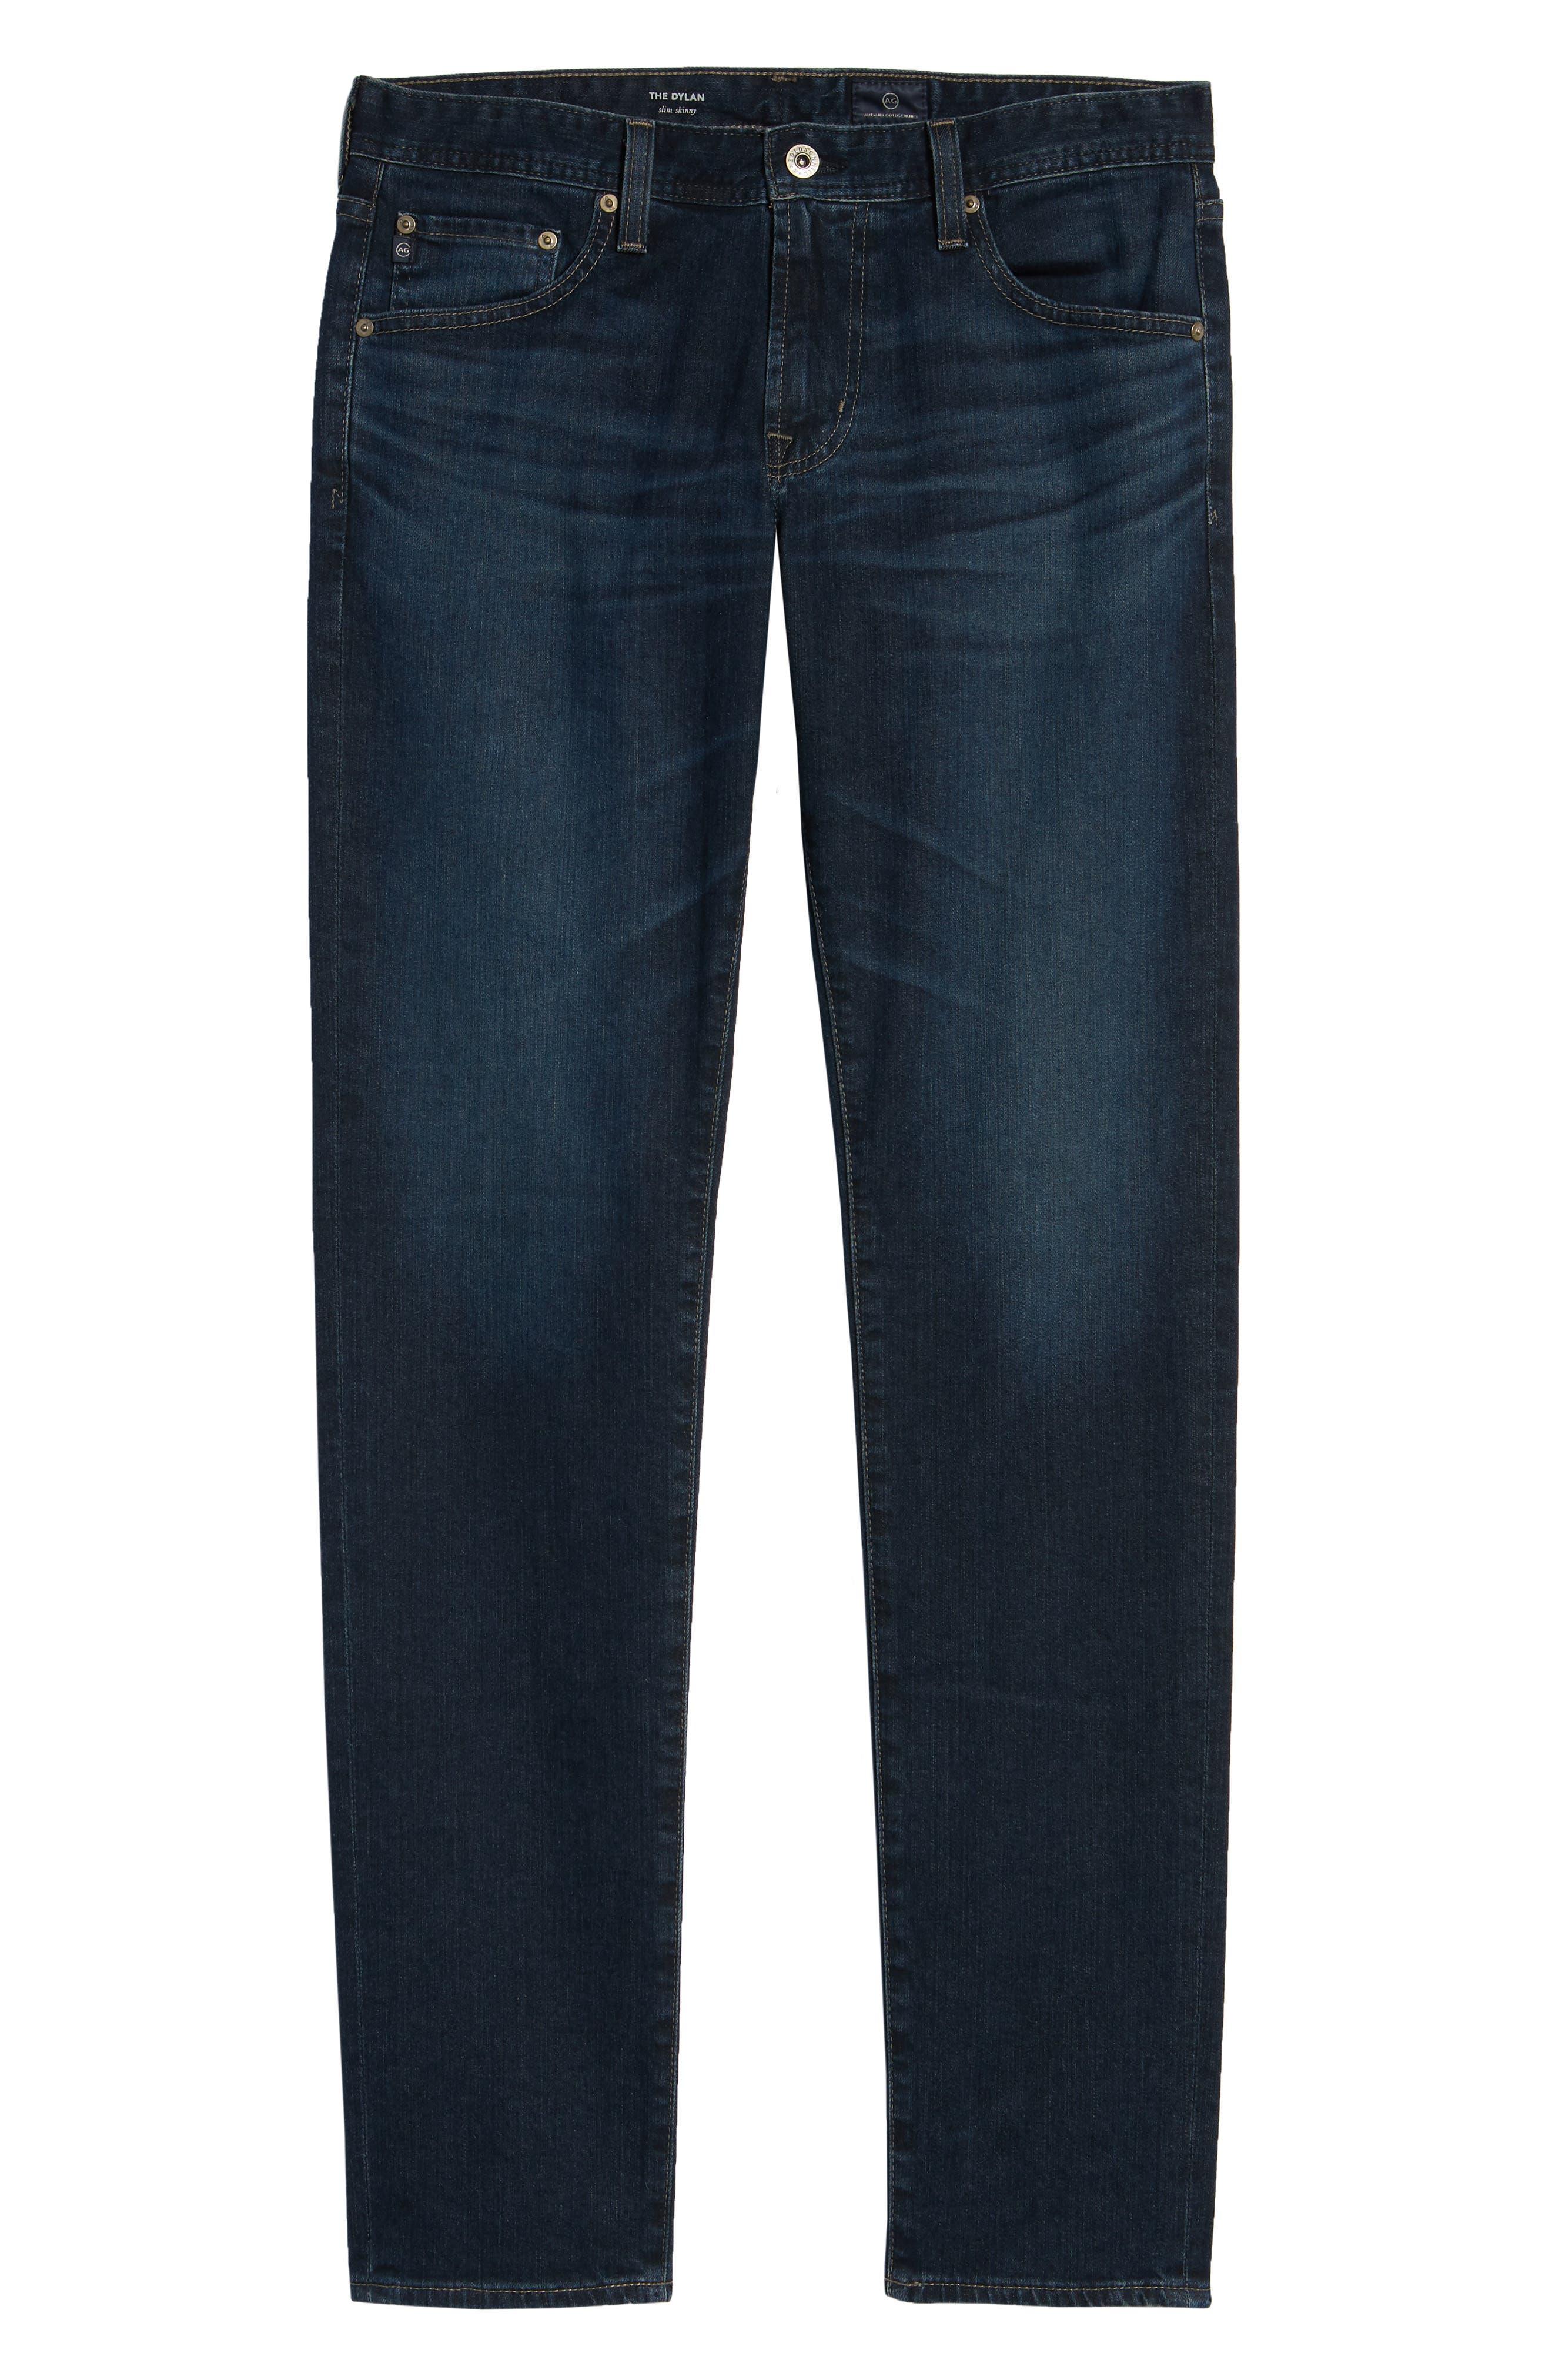 Dylan Skinny Fit Jeans,                             Alternate thumbnail 6, color,                             493